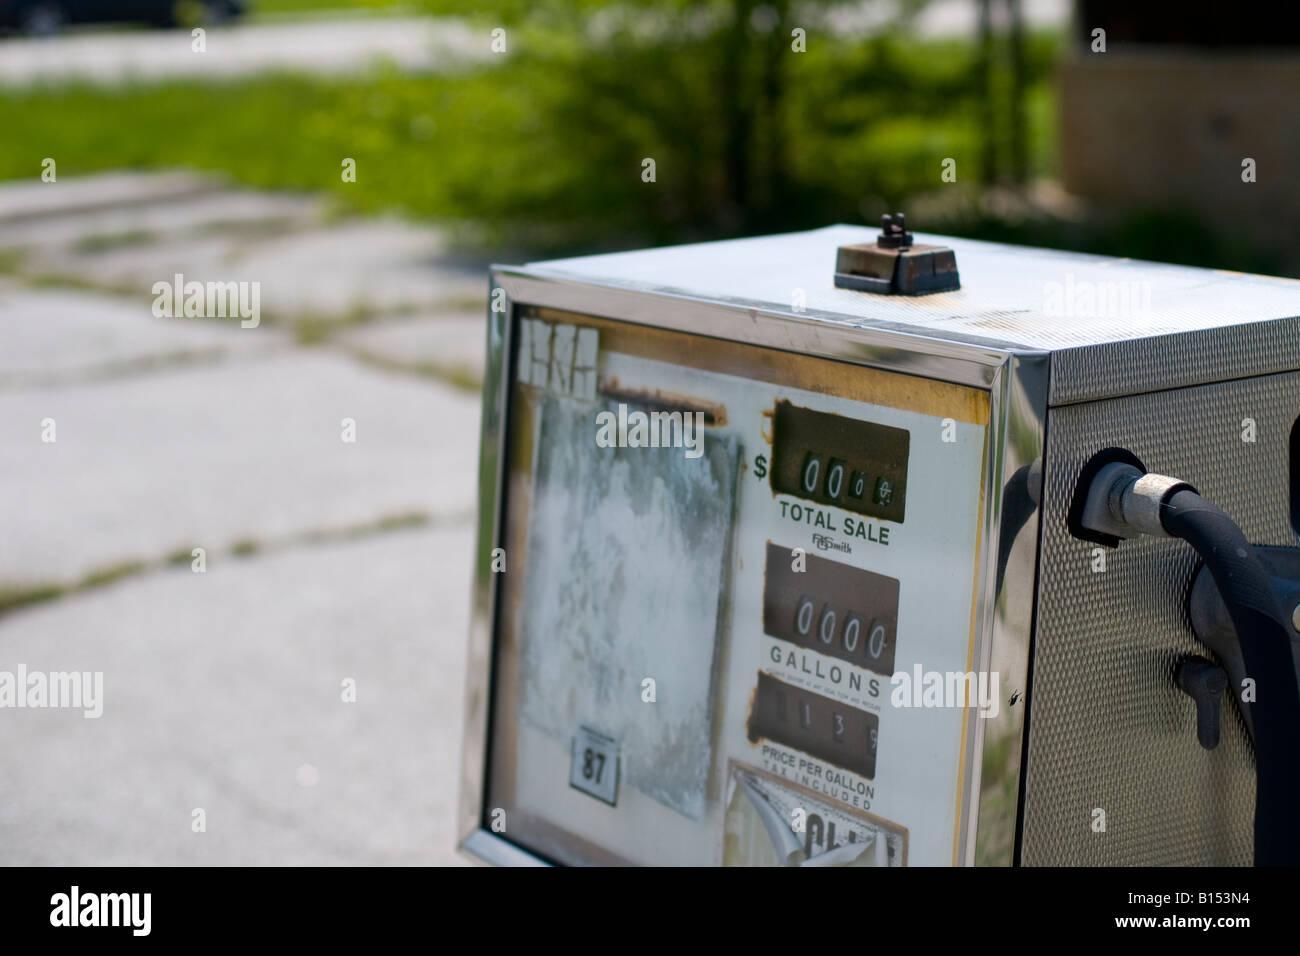 Abandoned gasoline pump along a highway, USA. - Stock Image